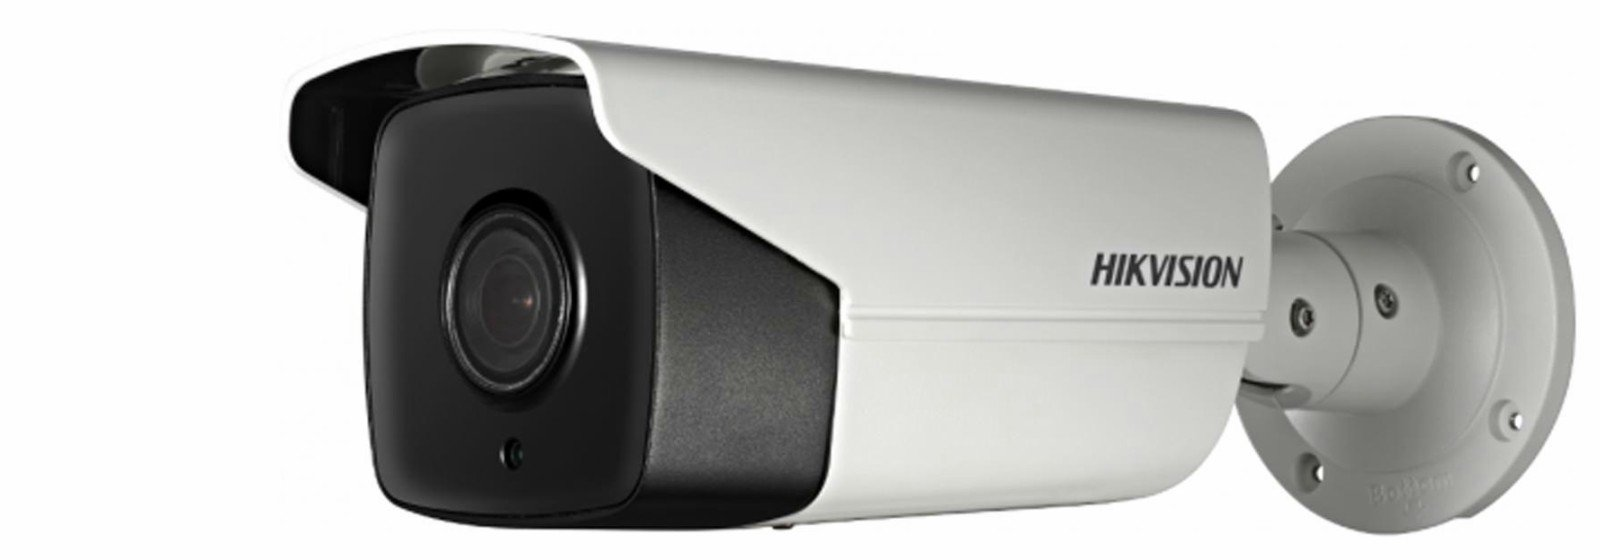 HikVision ANPR camera